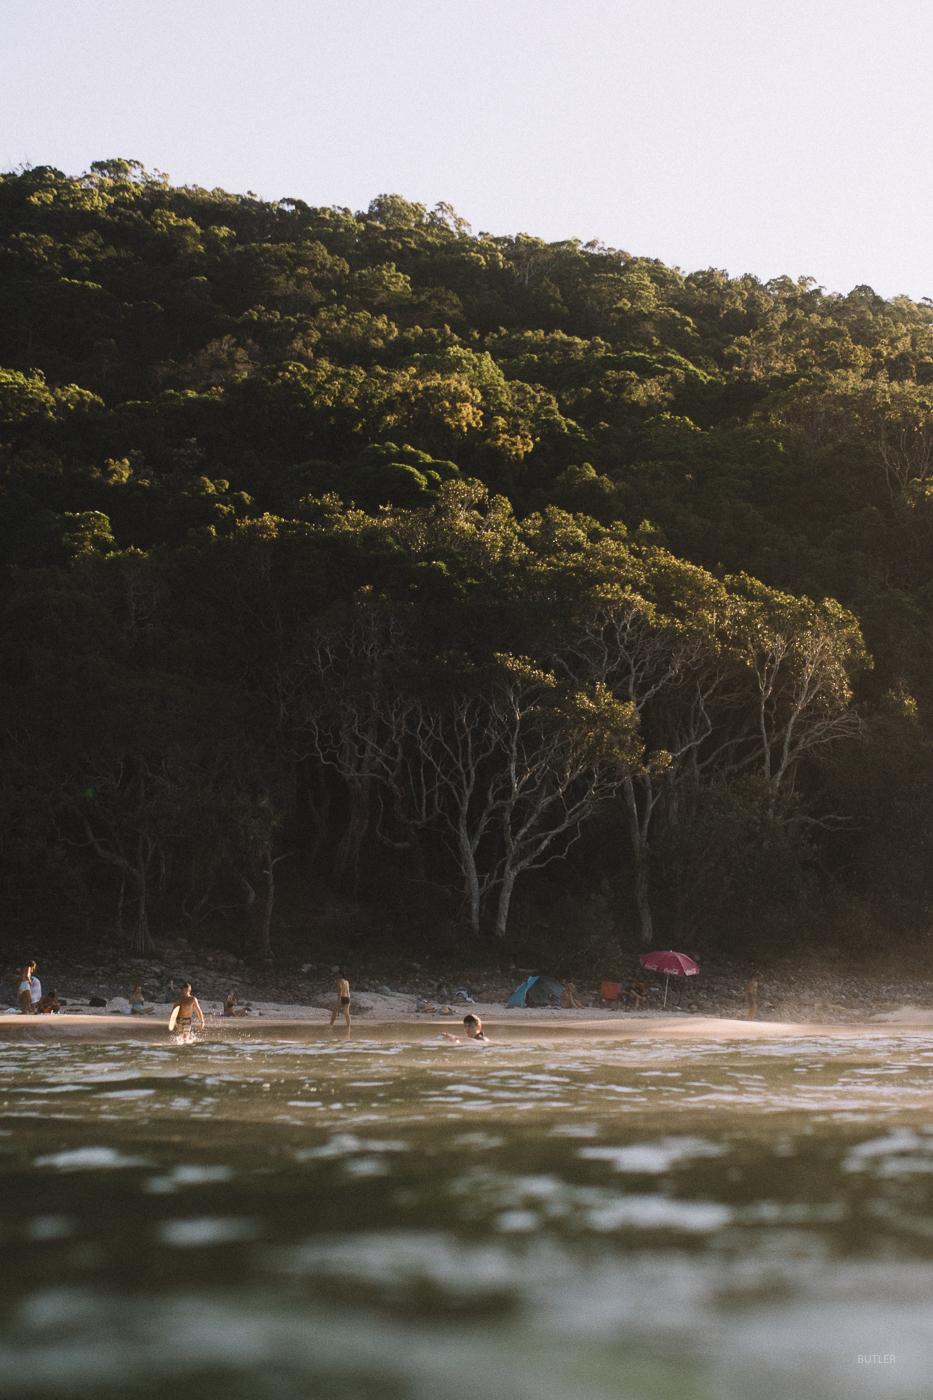 toby-butler-ocean-adventure-devon-unitedkingdom-surf-lifestyle-outdoor-photographer-photography-utah-fashion-england-1.jpg